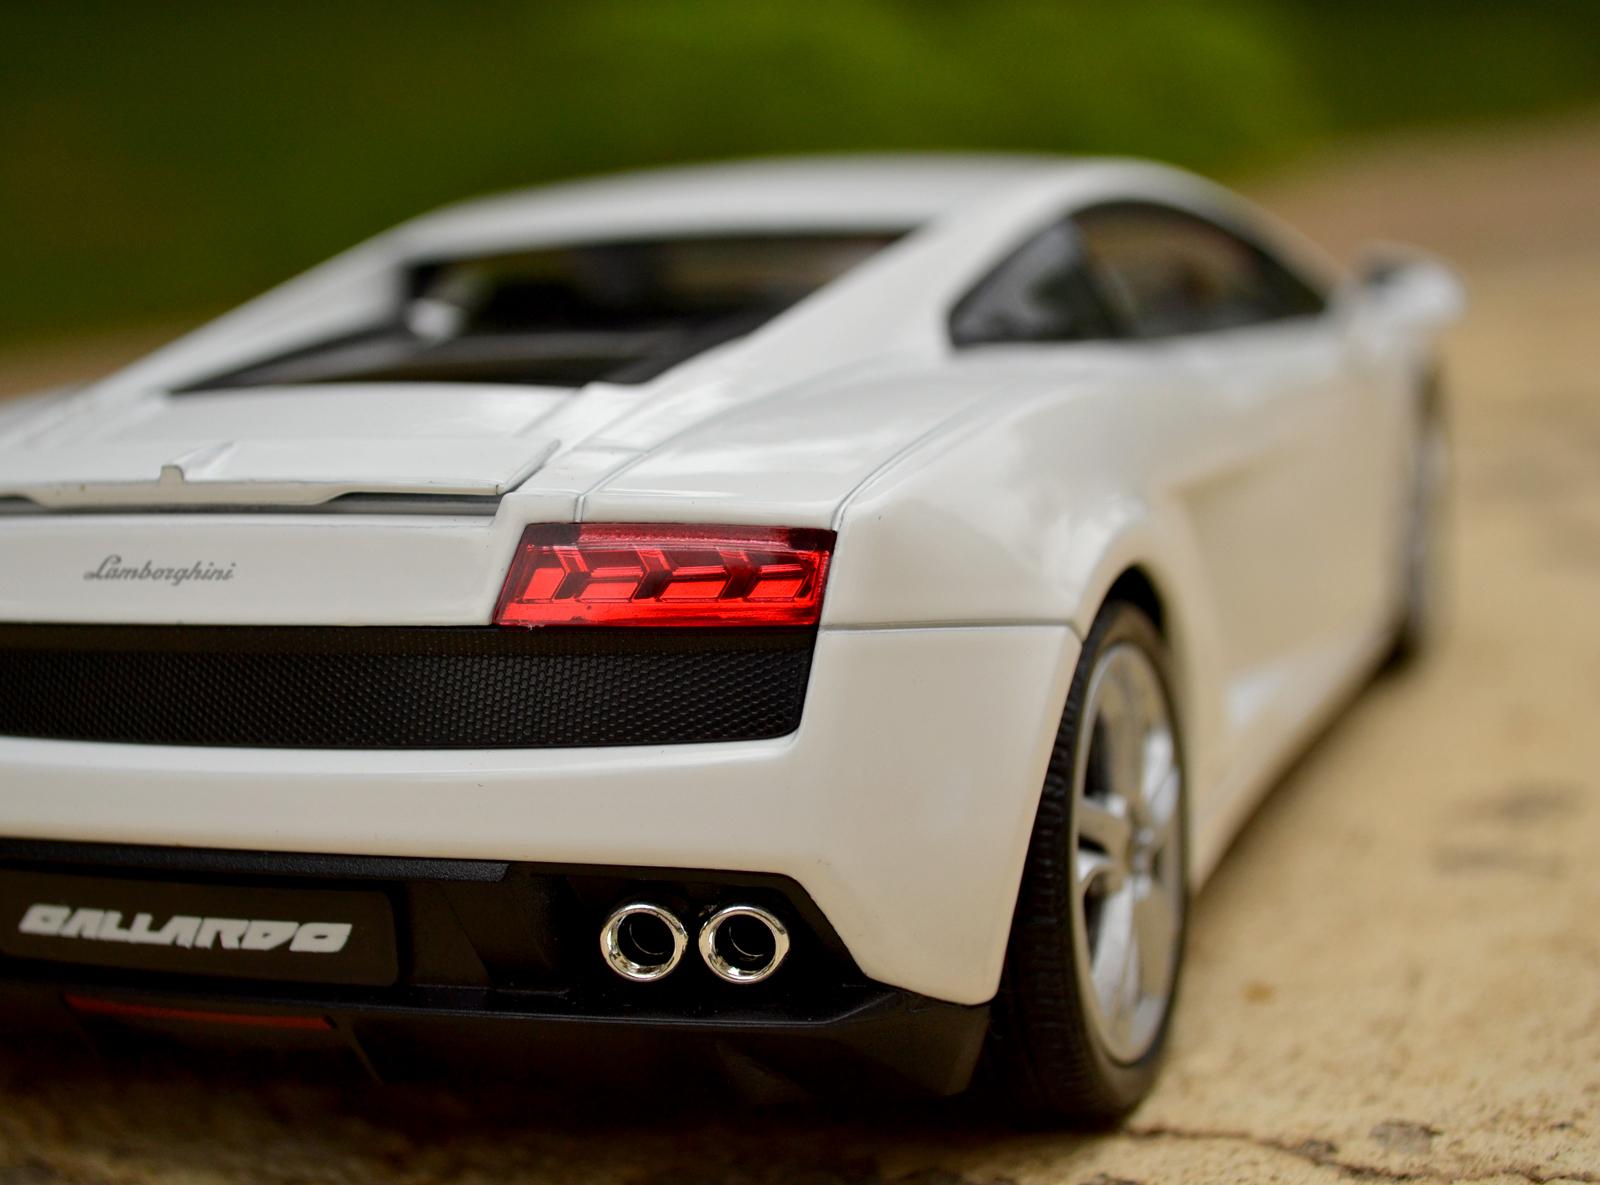 Lamborghini Gallardo Lp560 4 2008 Welly Nex Xdiecast